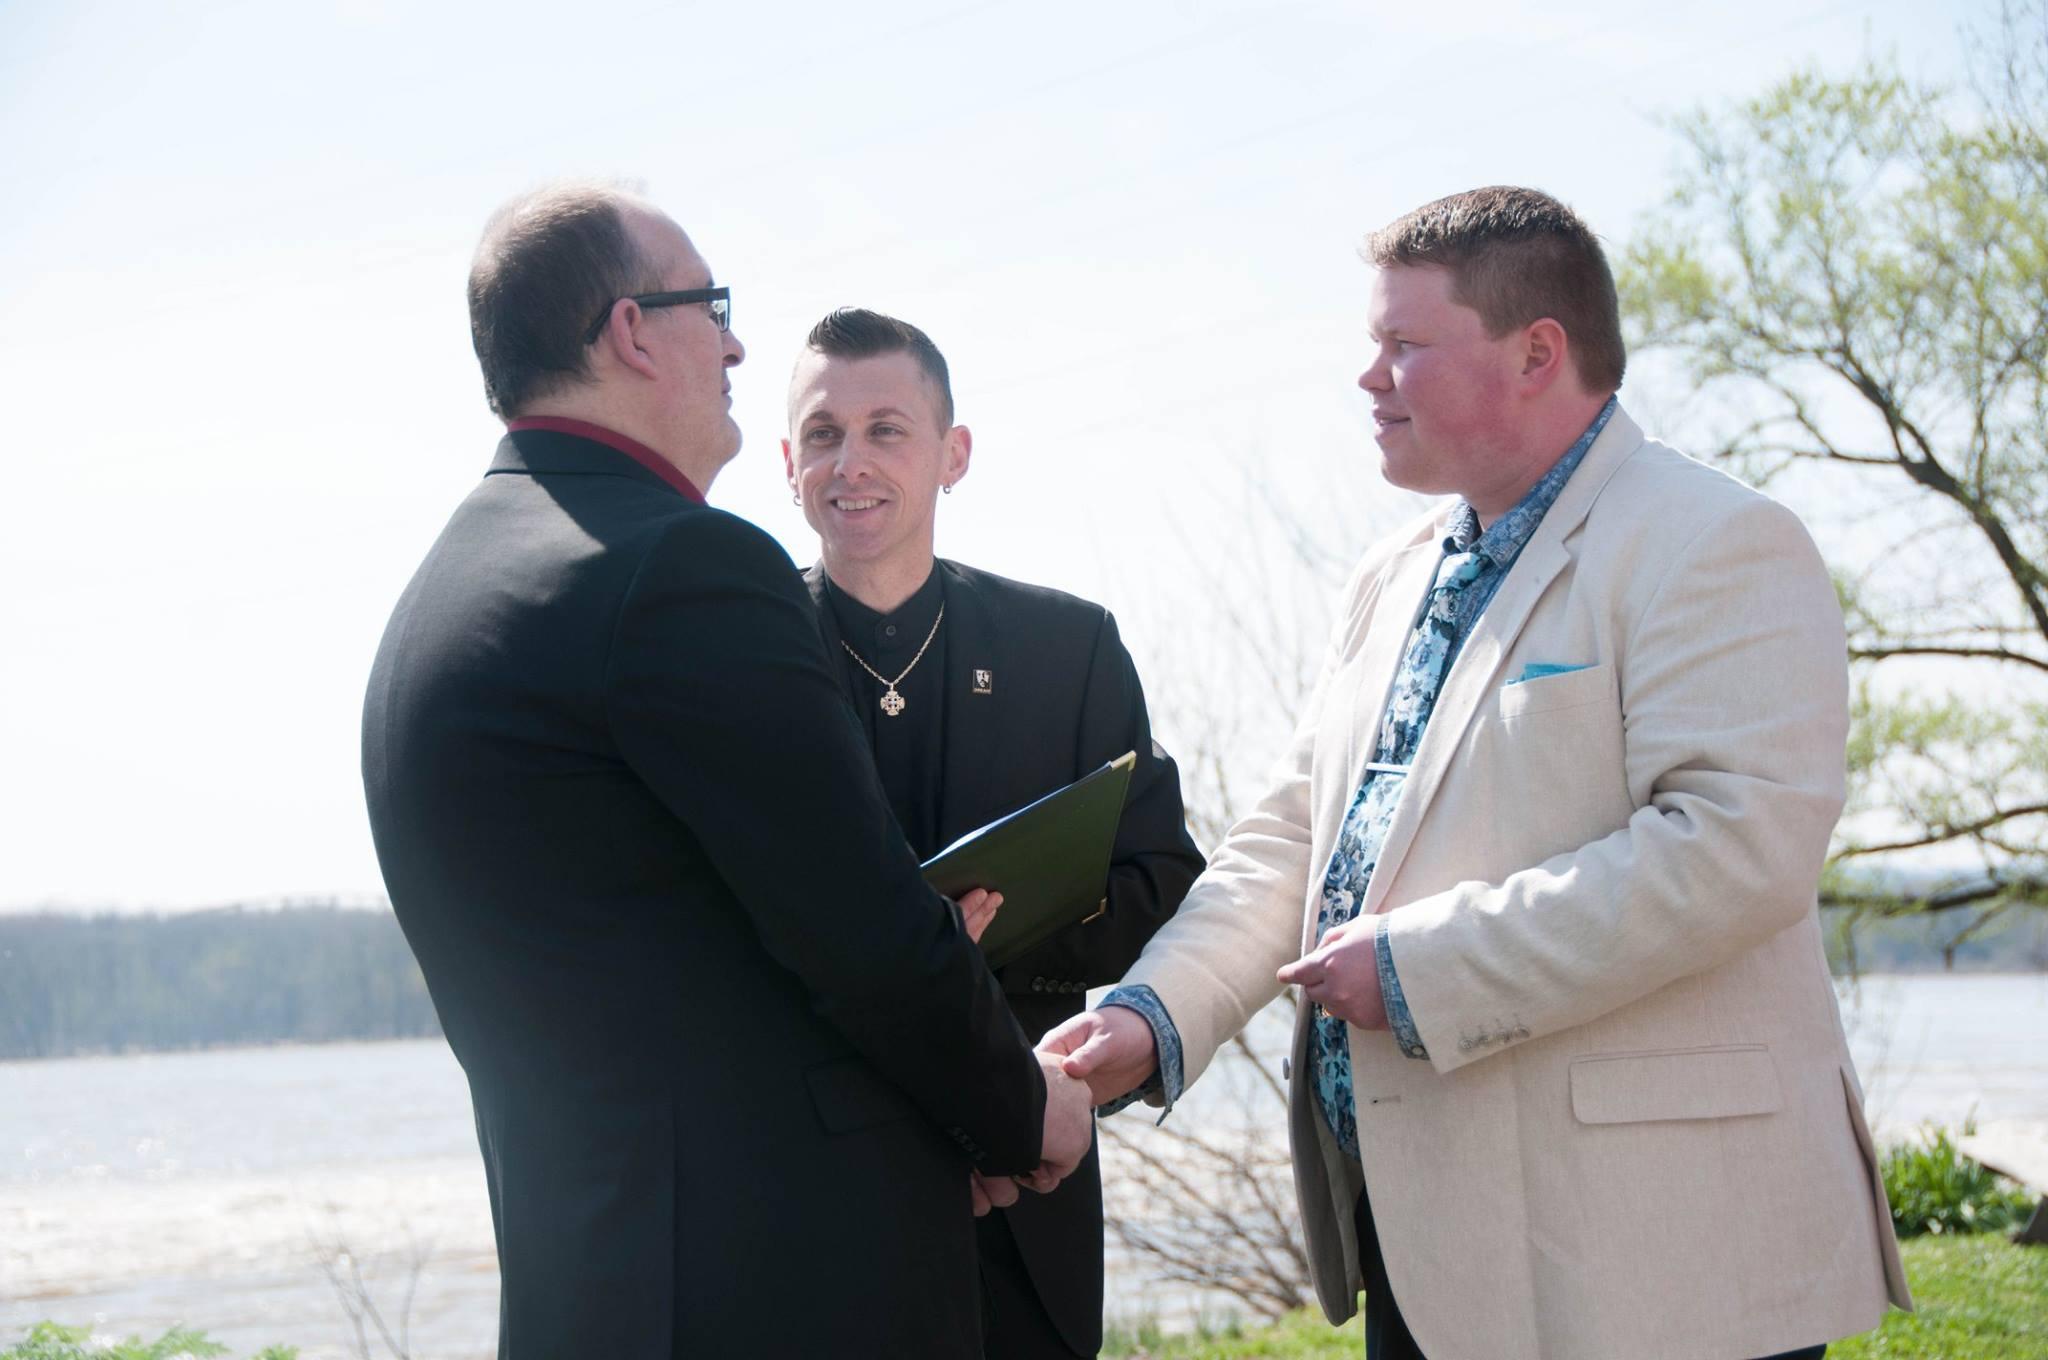 Rev. Blanchard officiating a wedding.